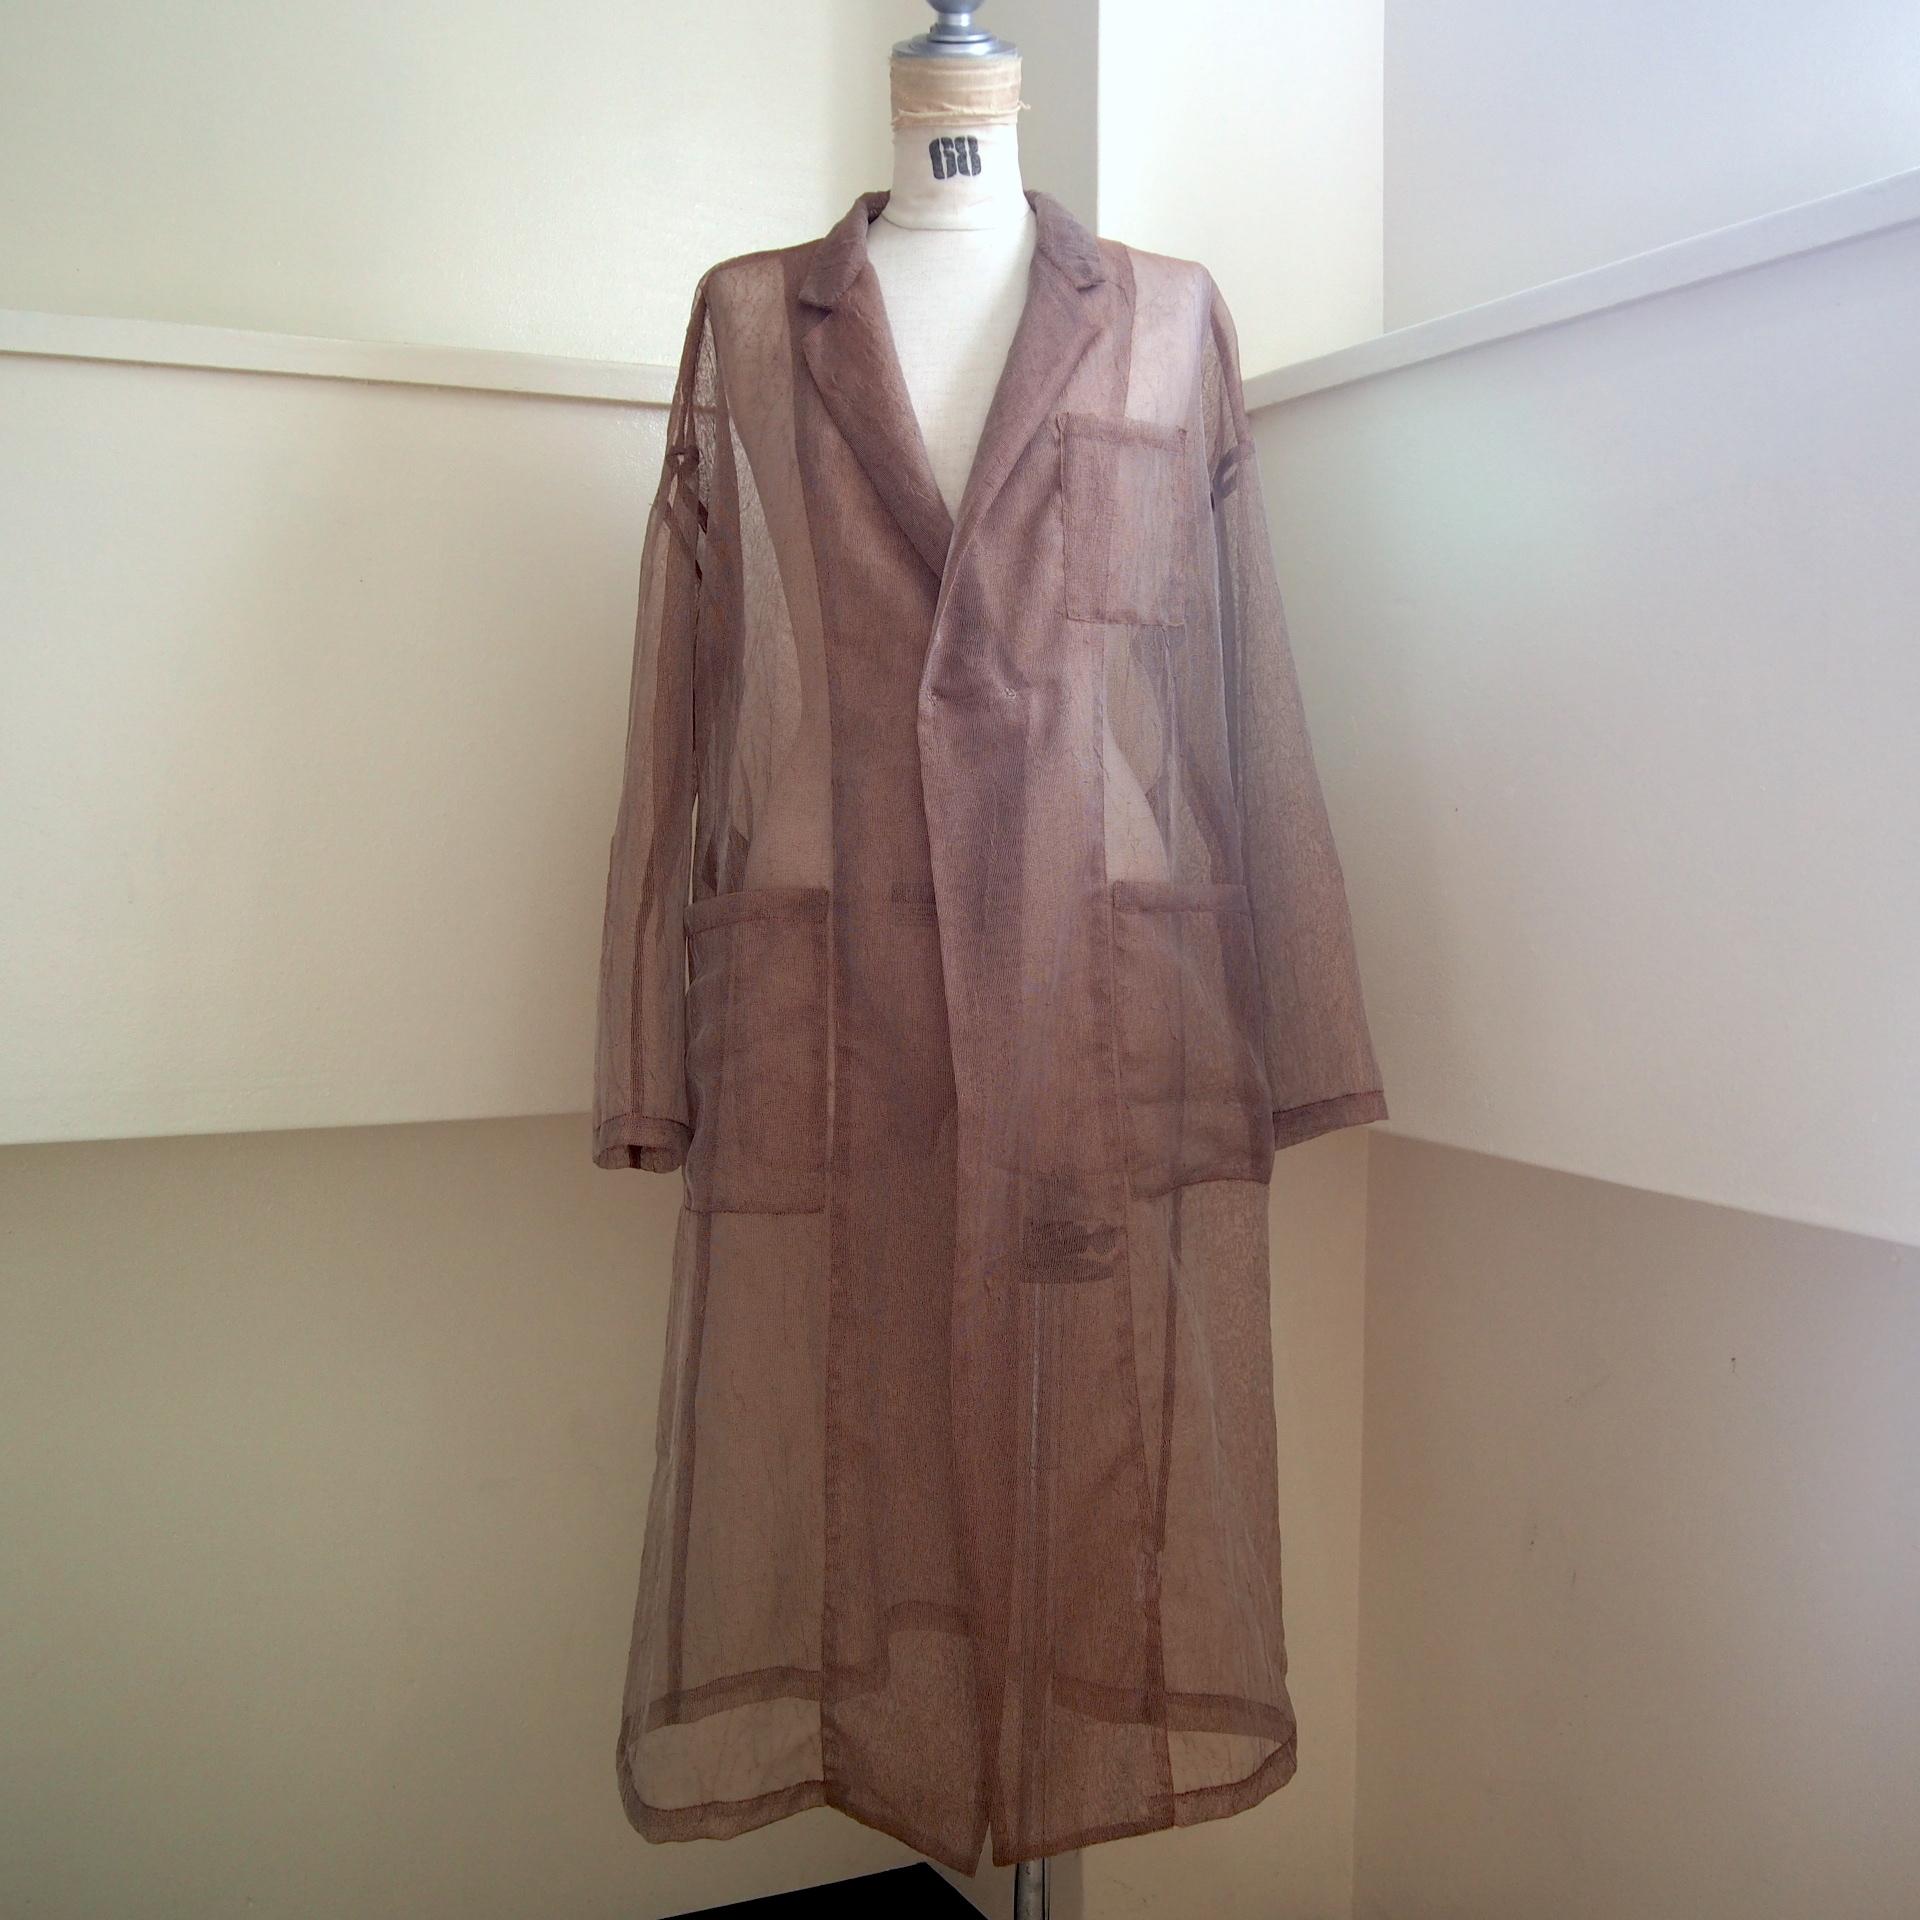 【RehersalL】mesh coat (brown)/【リハーズオール】メッシュコート(ブラウン)